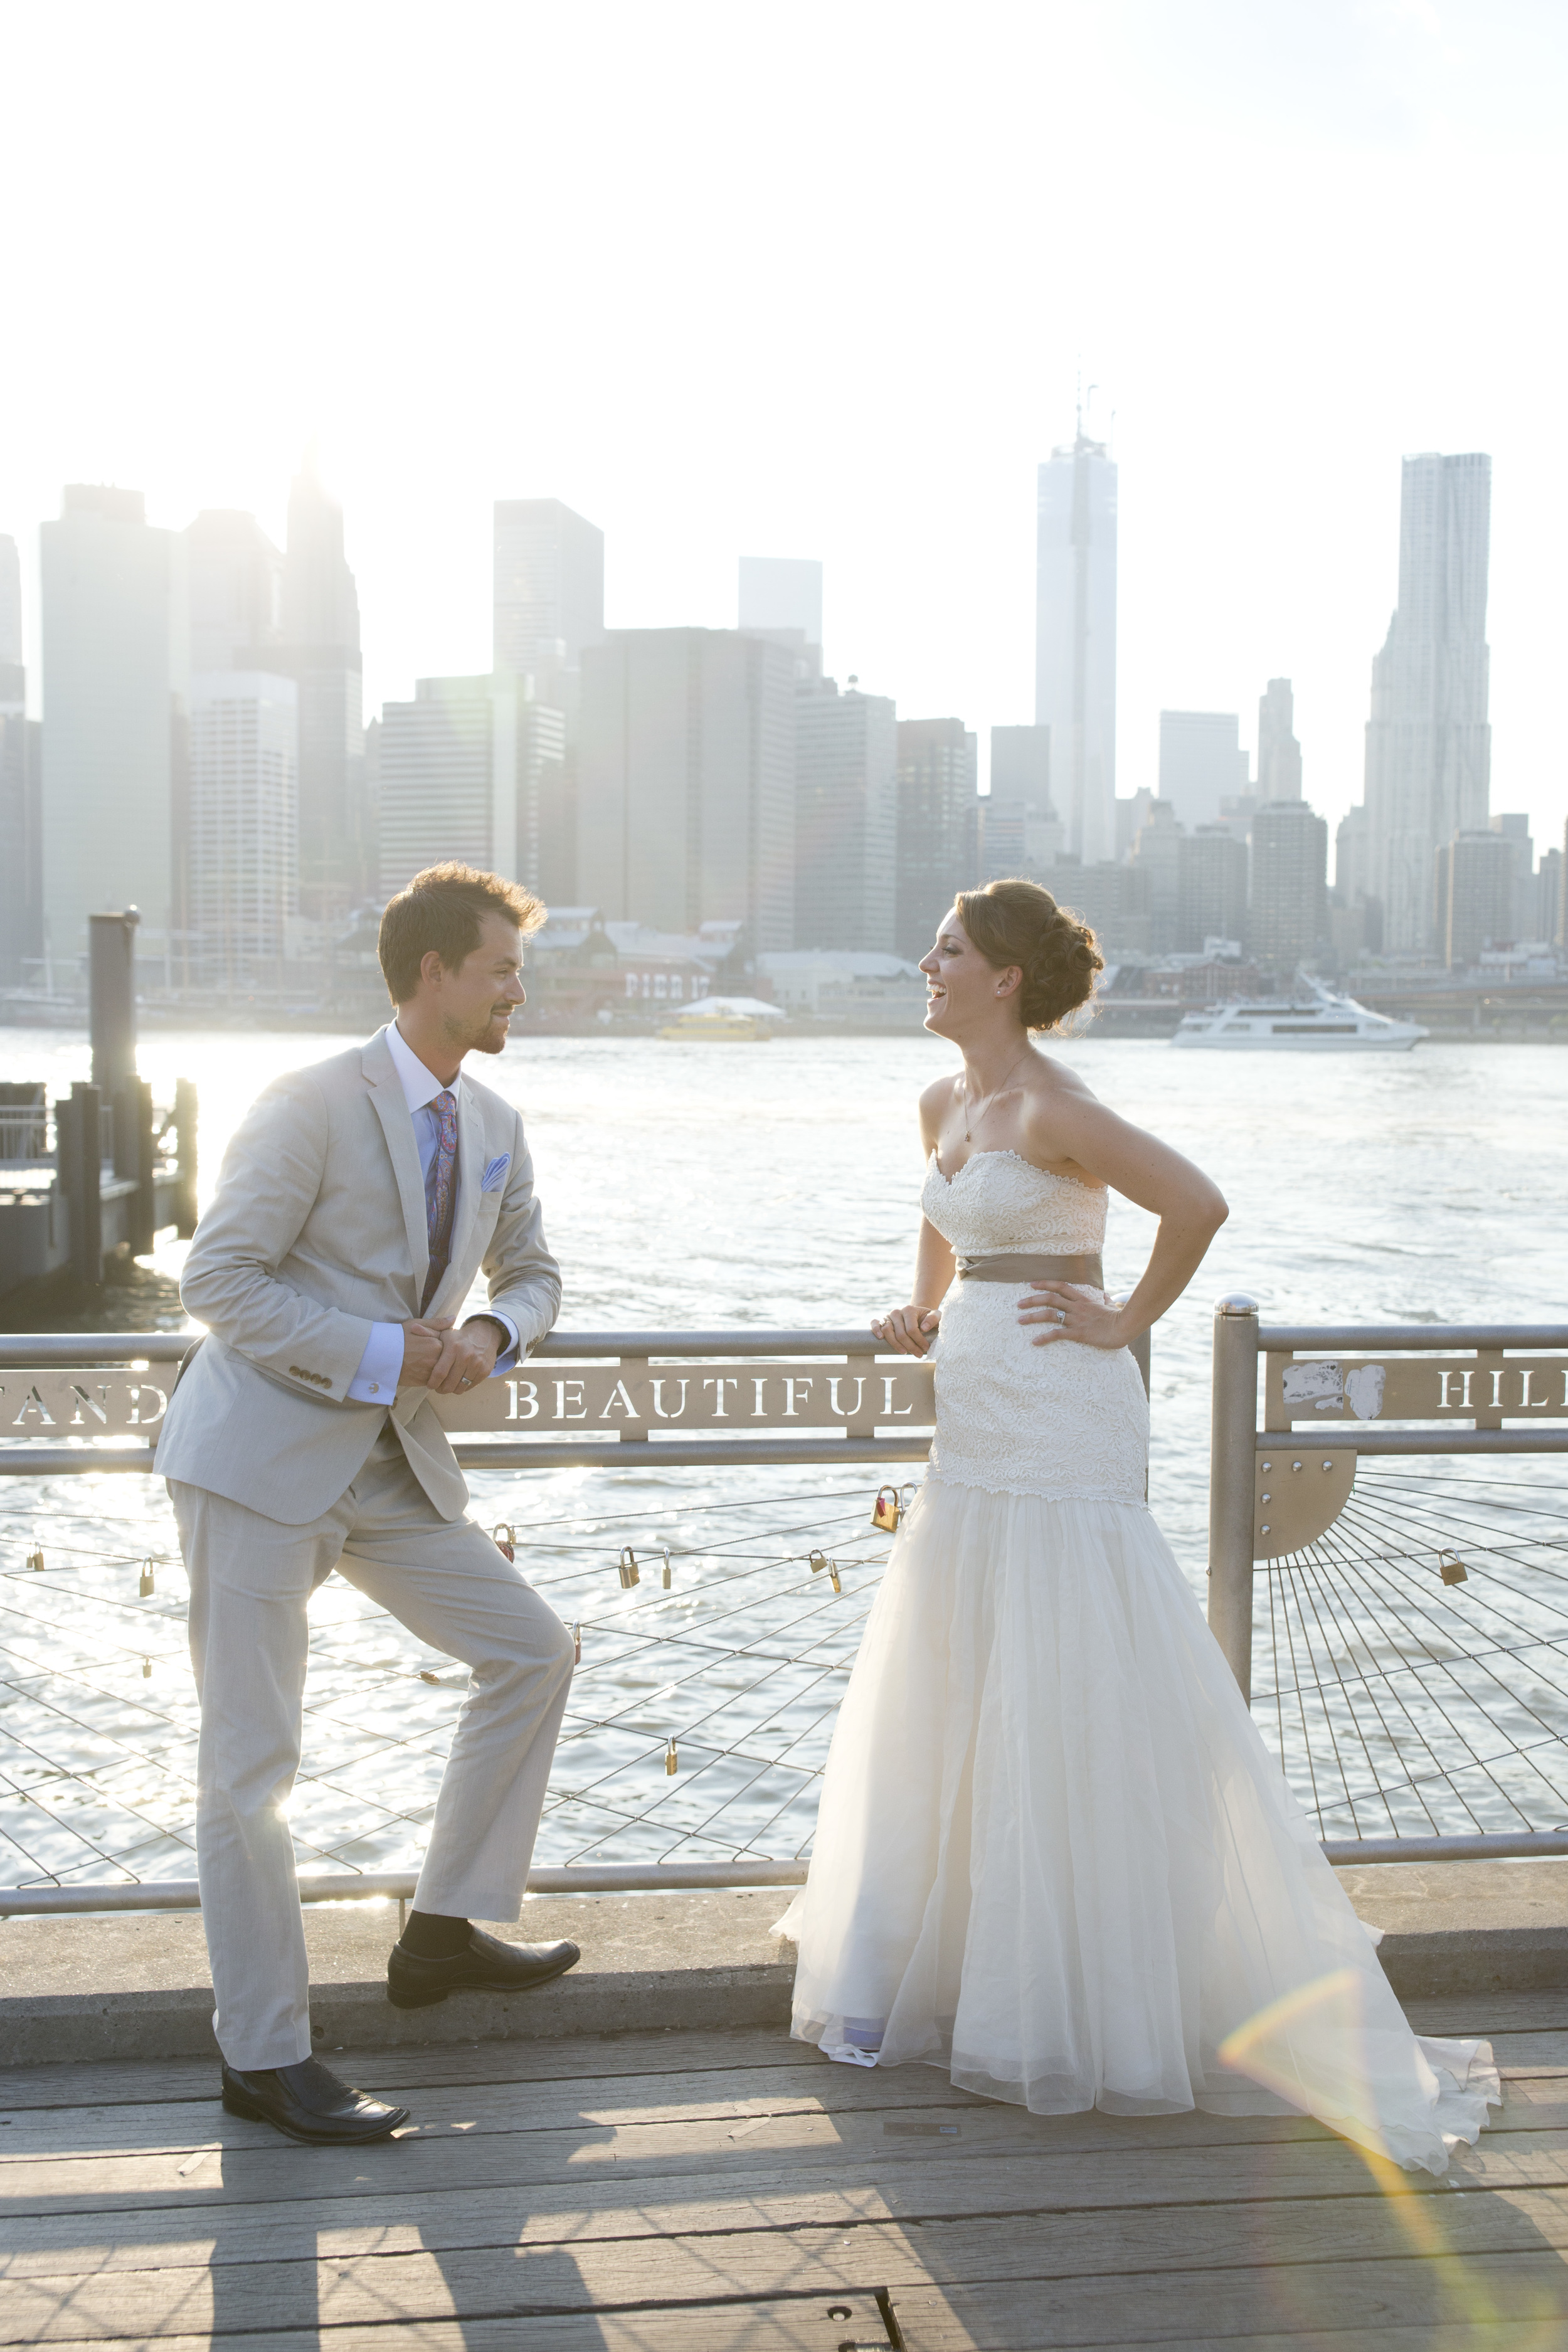 Wedding Photography, Bride and Groom Portrait